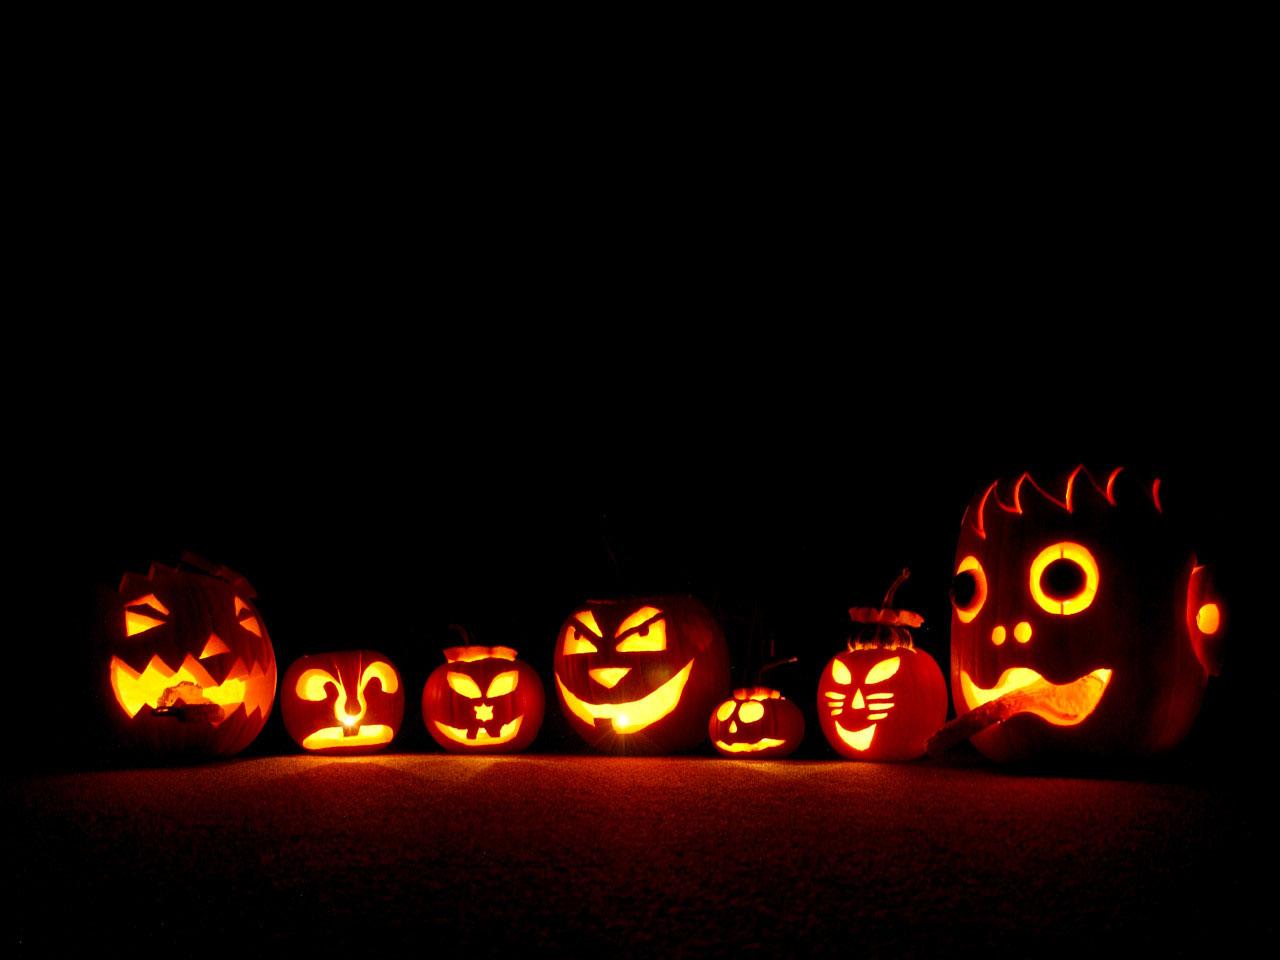 gw2 halloween pumpkin carving locations